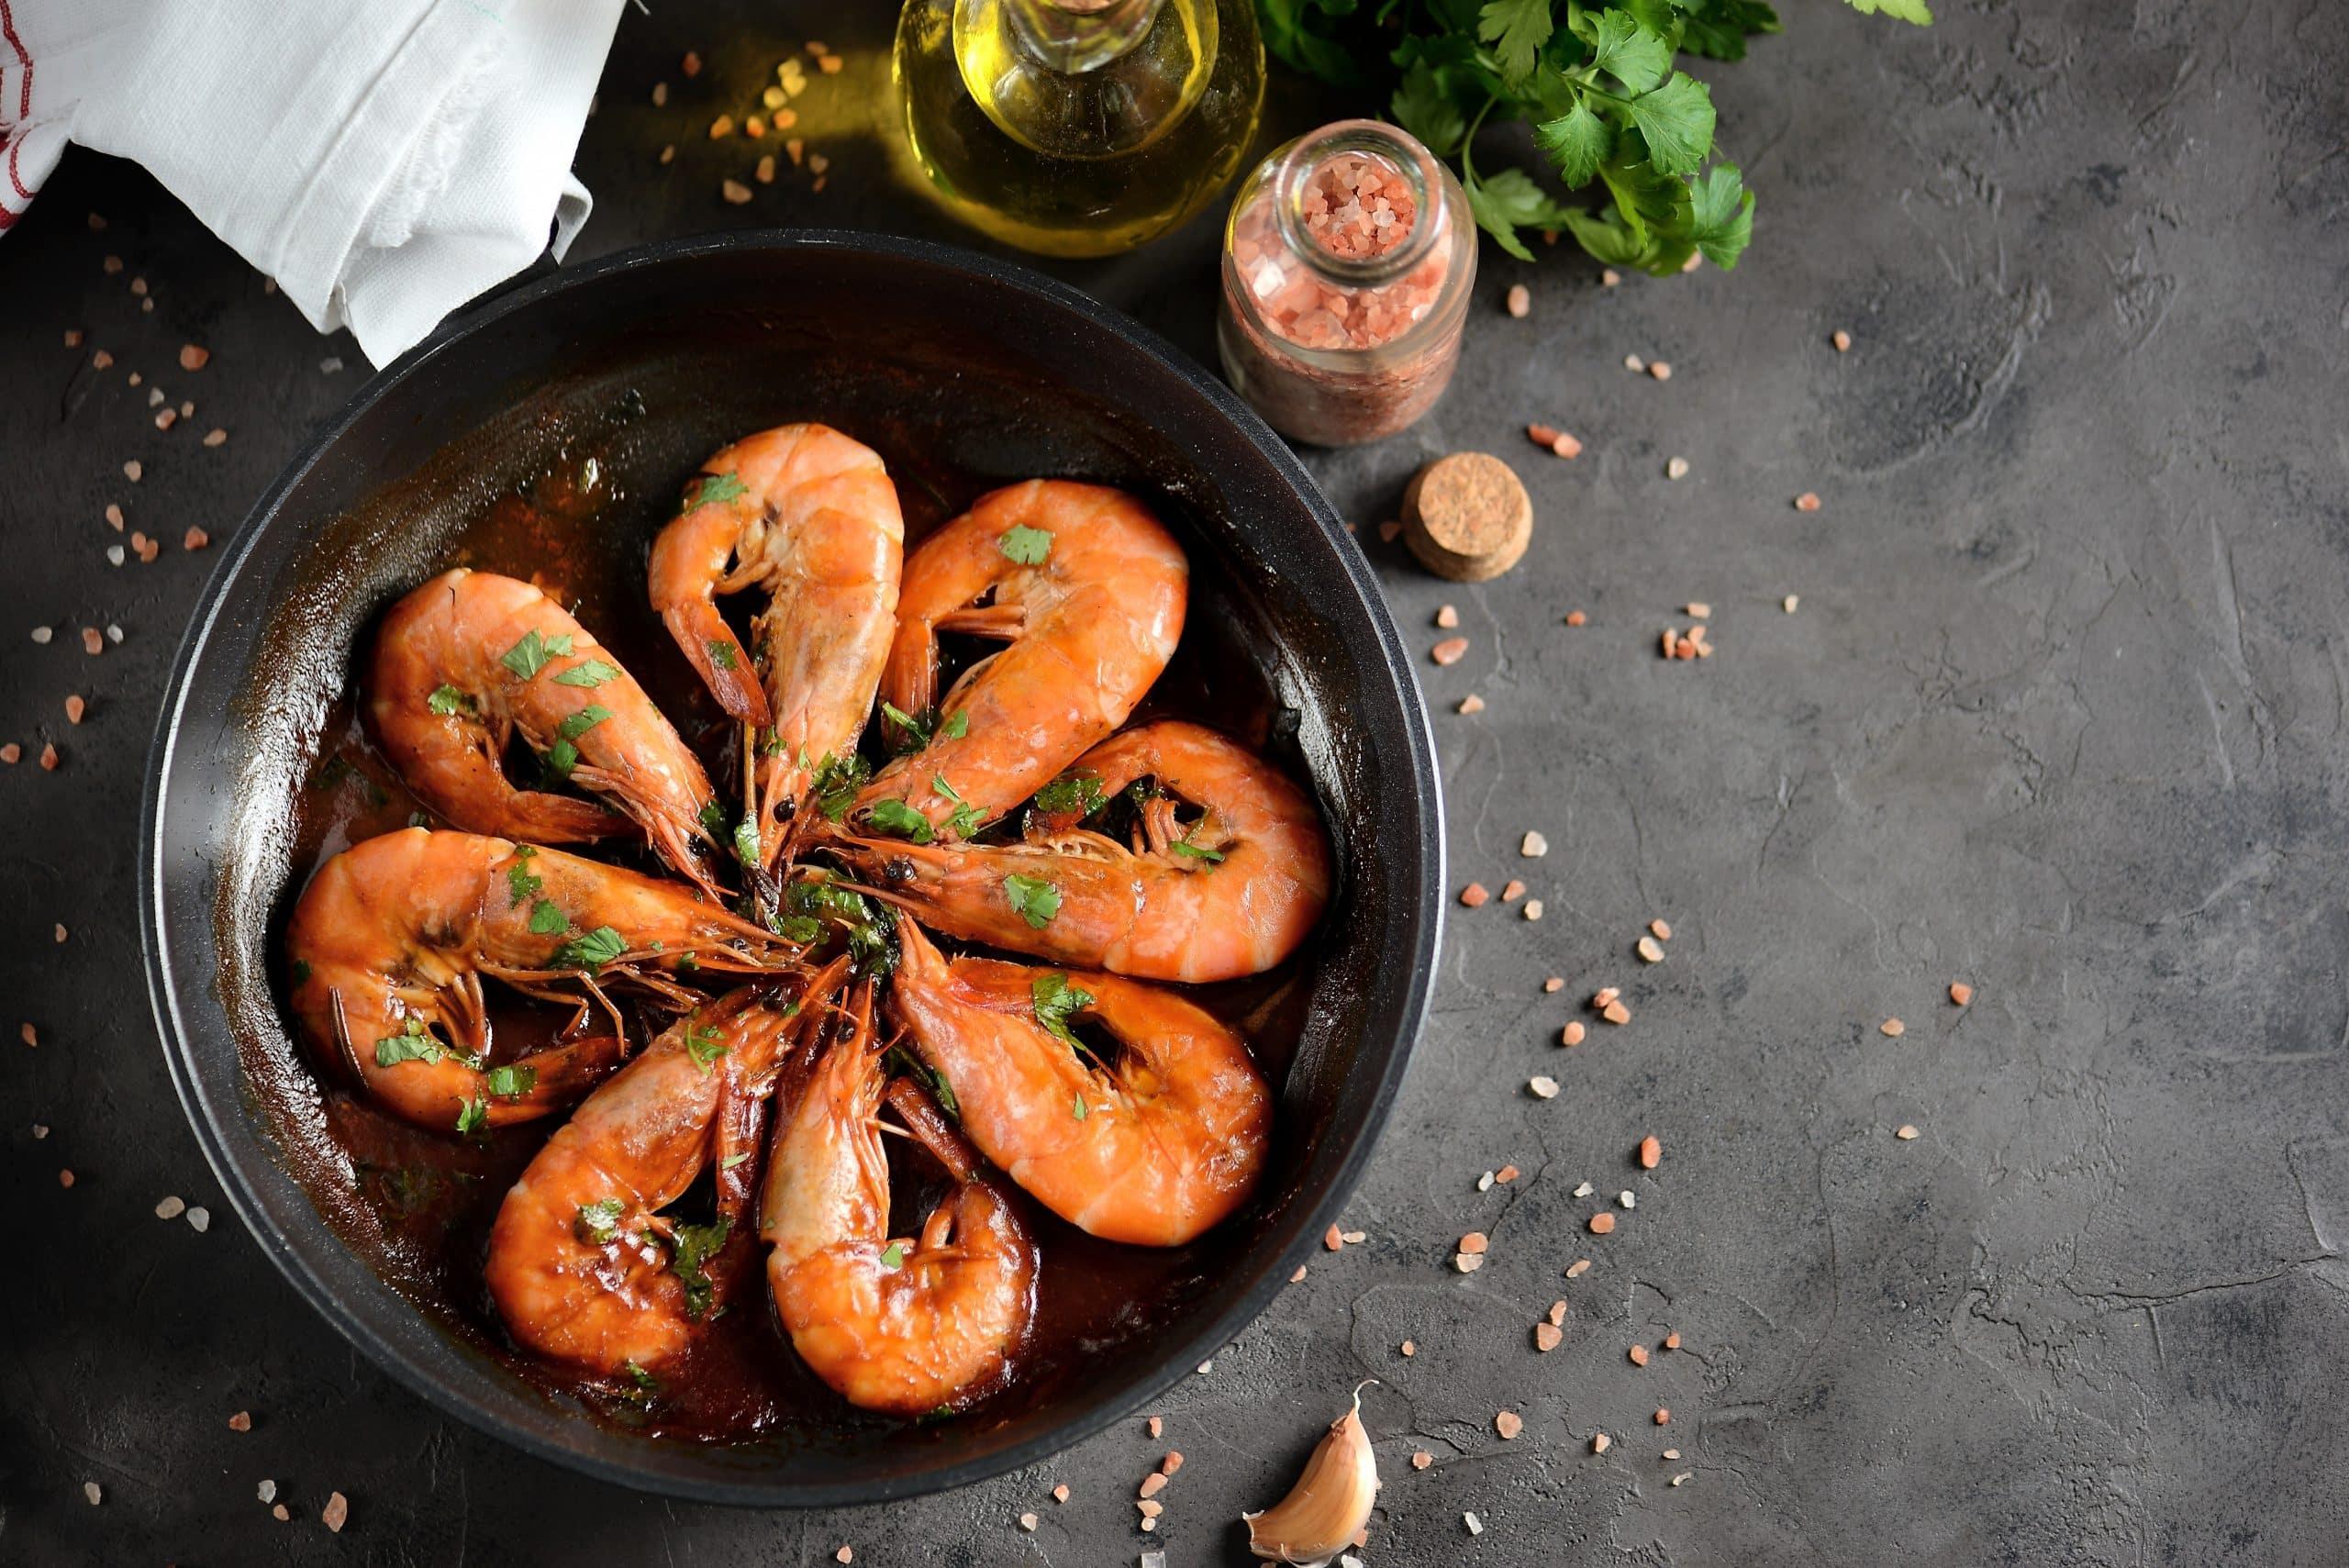 is shrimp bad for diet